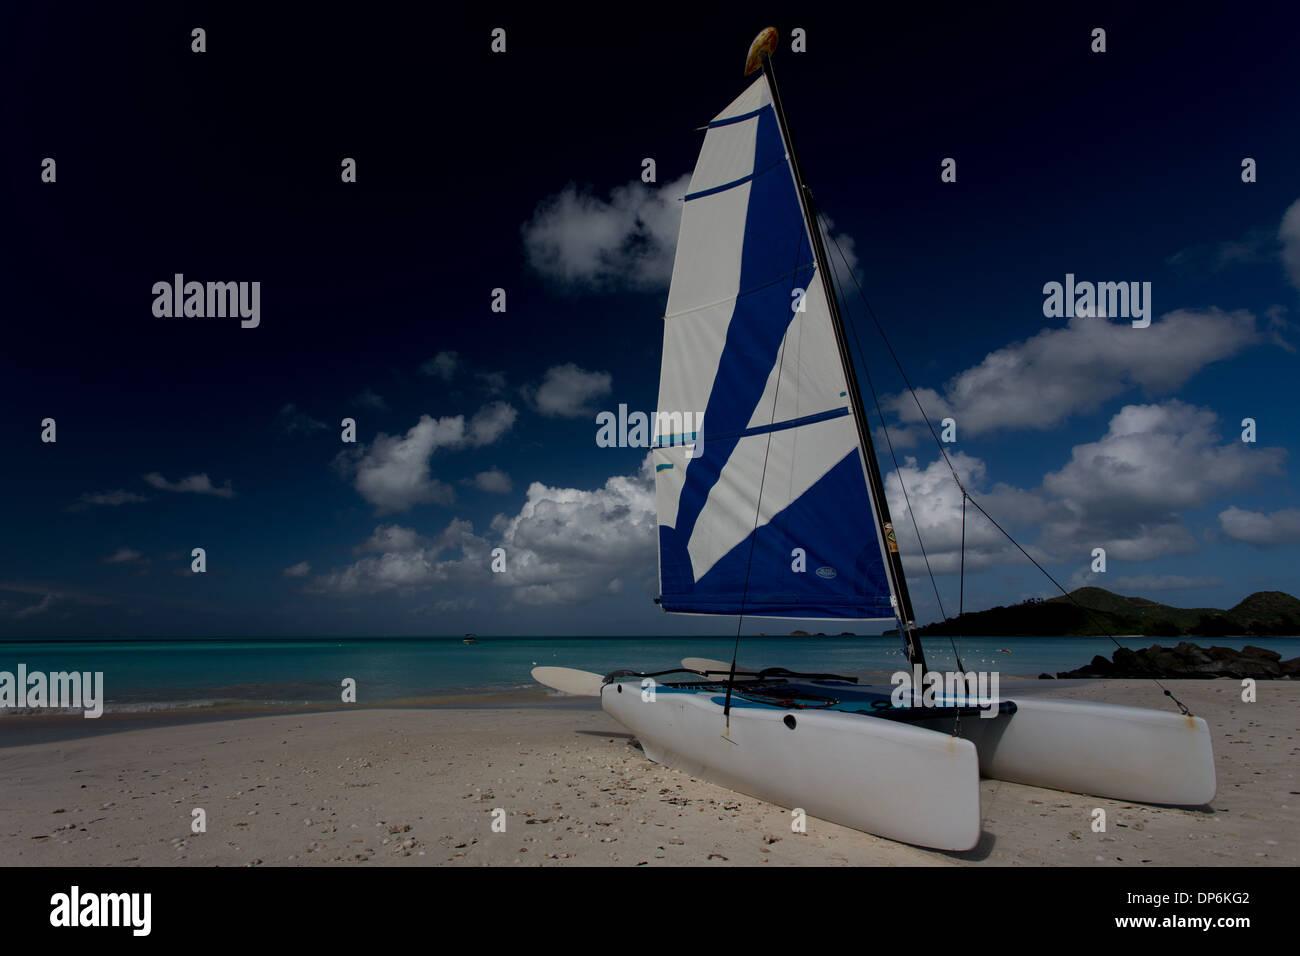 Hobie Catamaran on Jolly Beach , Jolly Beach resort and spa, Bolans Village, Antigua, Leeward Islands, West Indies - Stock Image